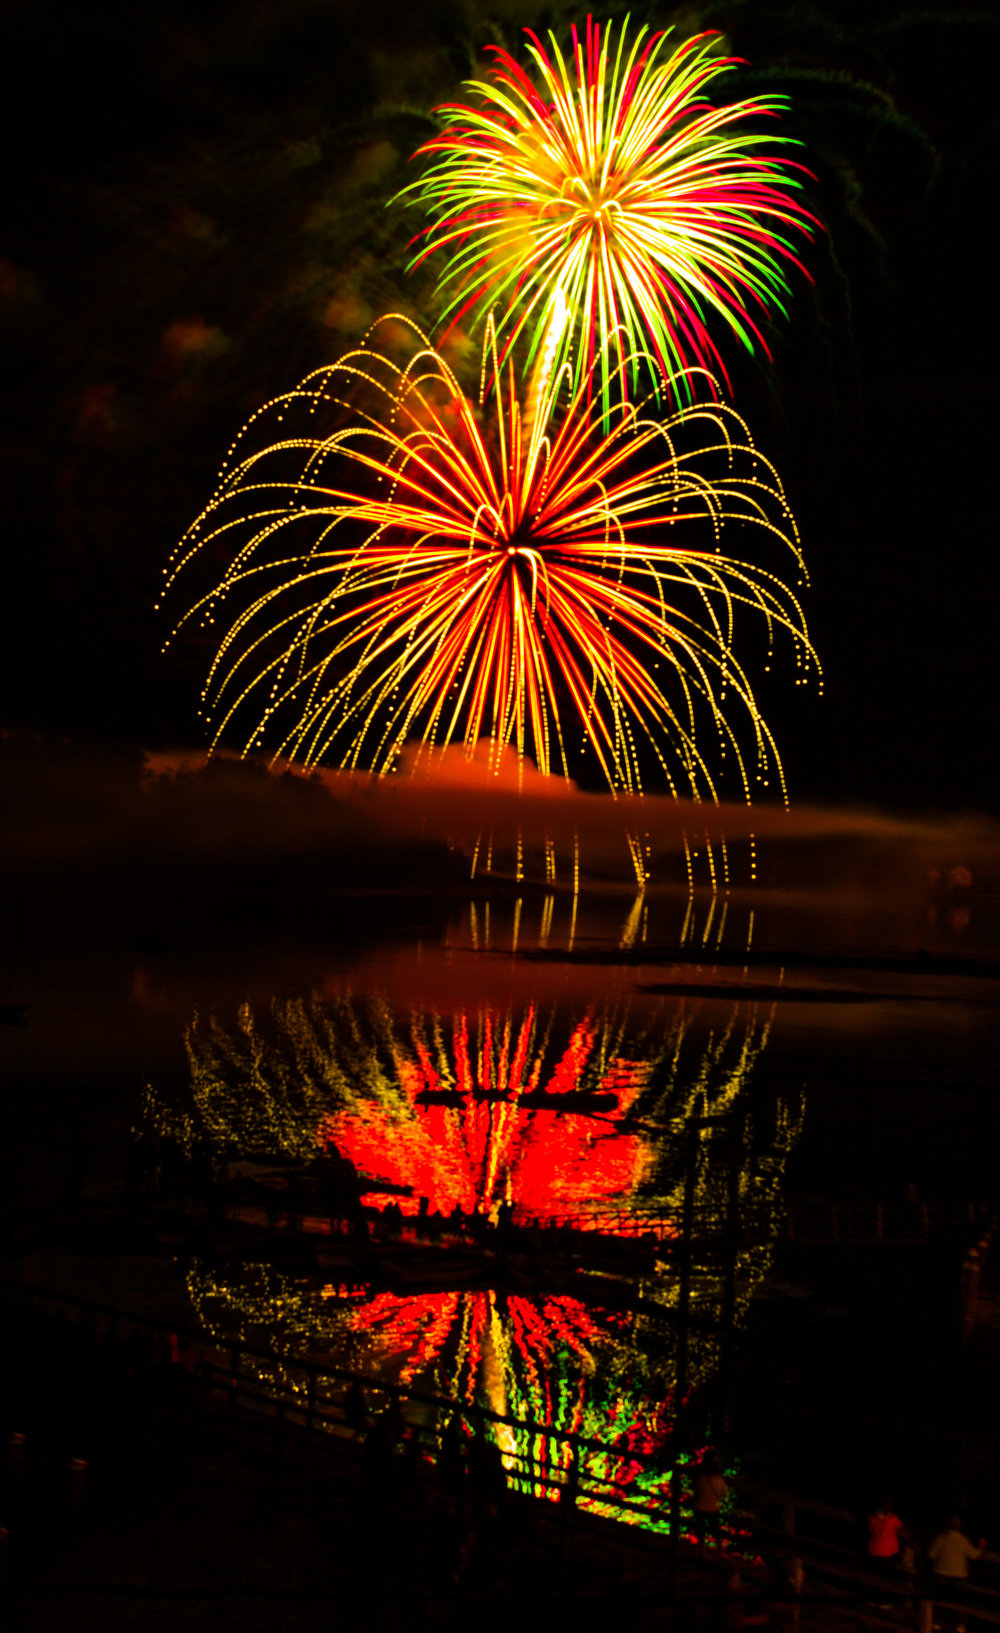 Tenants Harbor fireworks